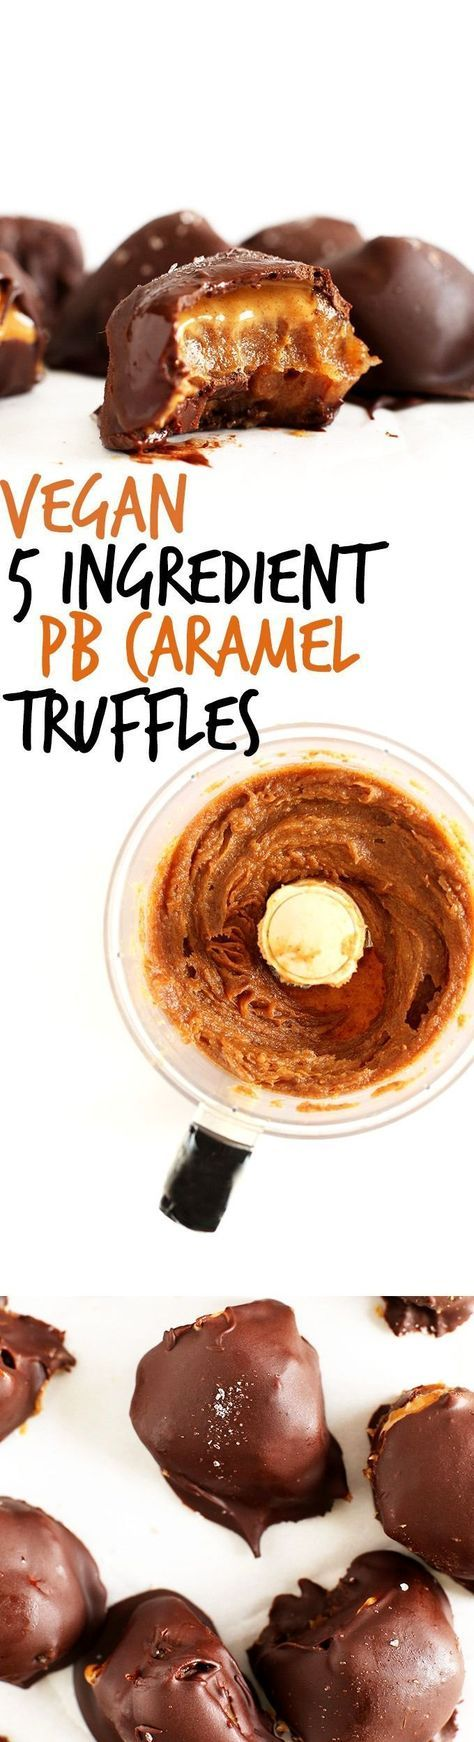 AMAZING 5 ingredient Vegan Truffles with salted DATE CARAMEL, Peanut Butter and Semisweet Chocolate! #vegan #glutenfree #veganrecipes